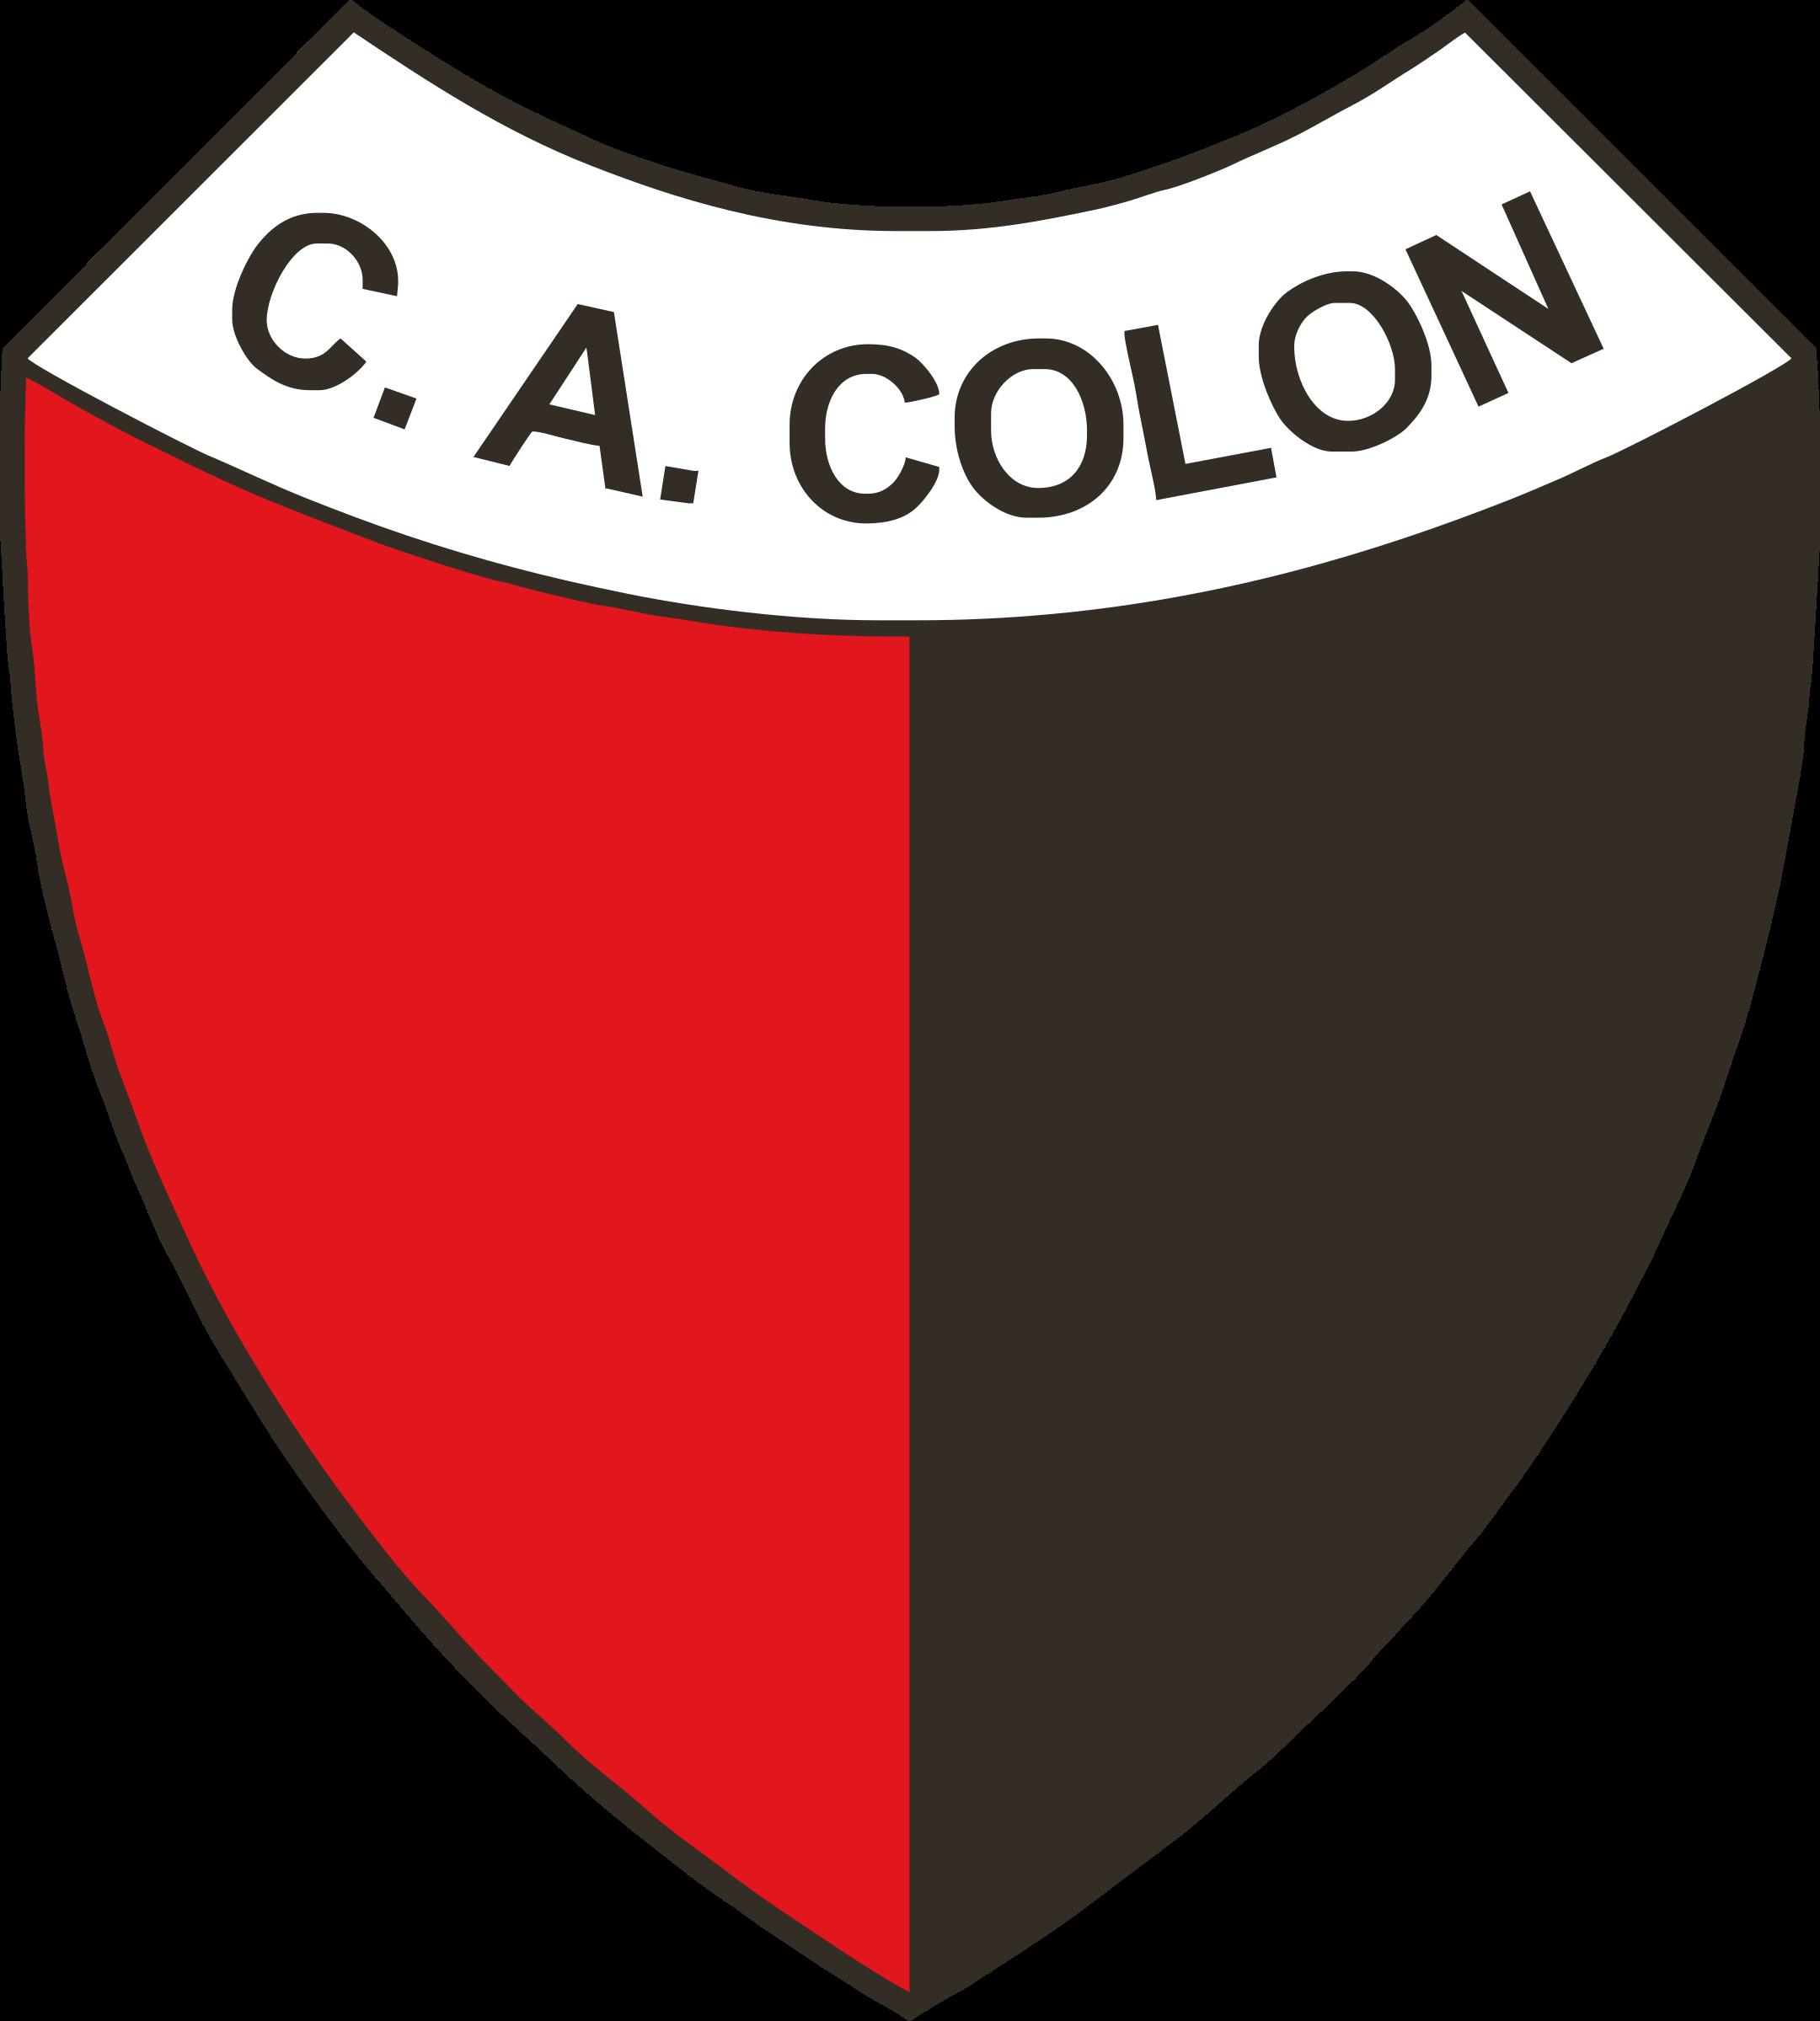 c a colon logo 1 - Club Atlético Colón Logo